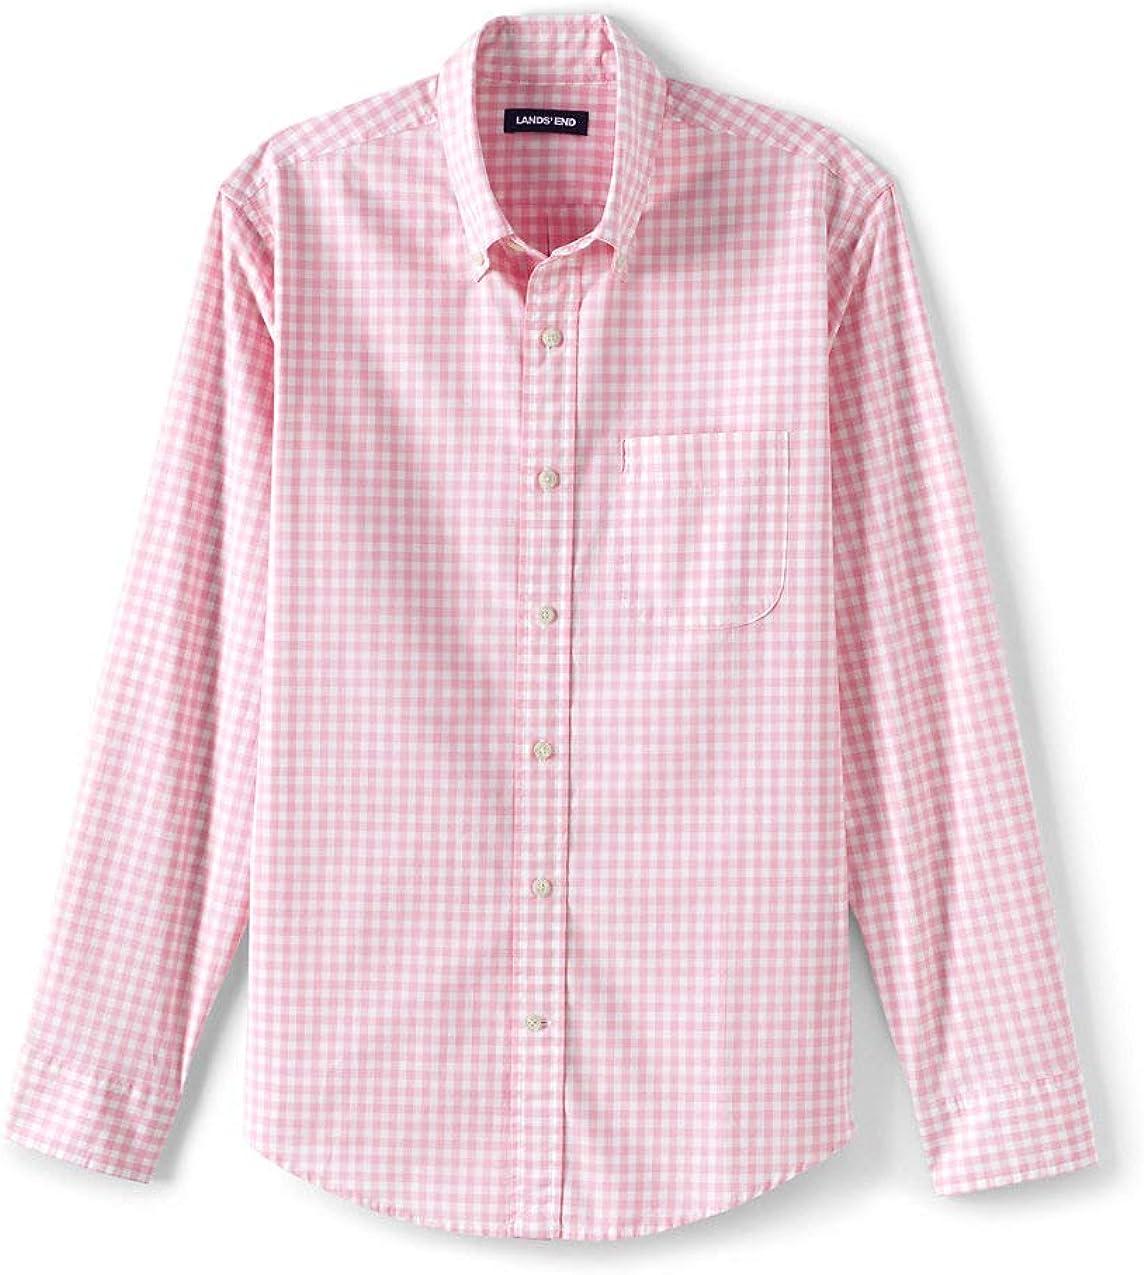 Lands' End Men's Traditional Fit Essential Lightweight Poplin Shirt